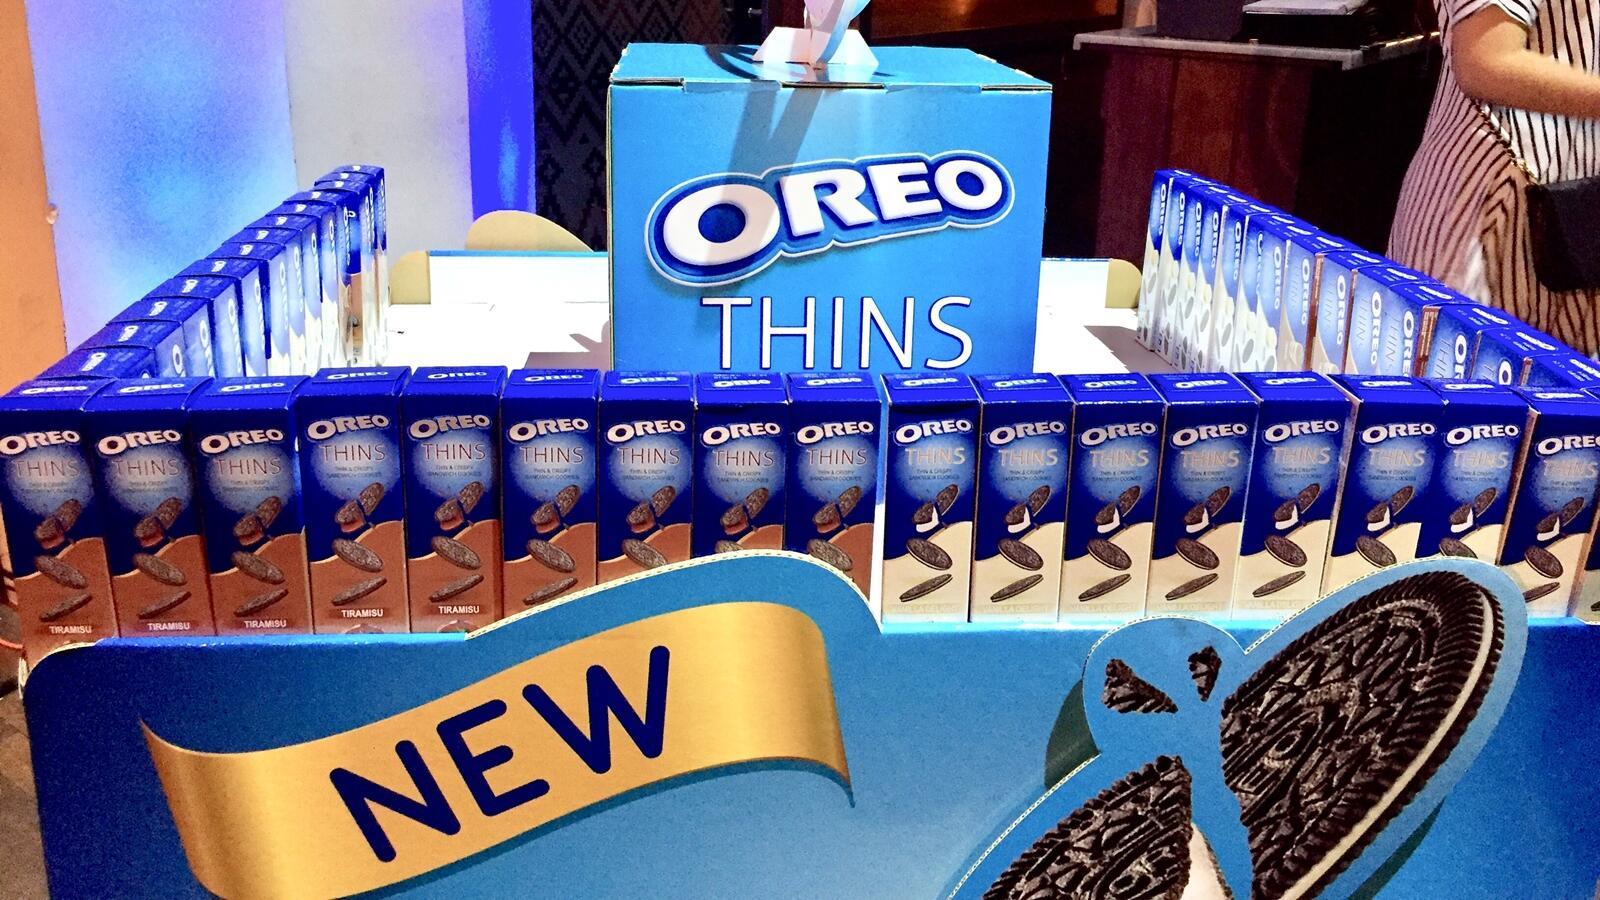 Garap Pasar Premium, Produsen Oreo Beli Pabrik Biskuit Rp 7 Triliun